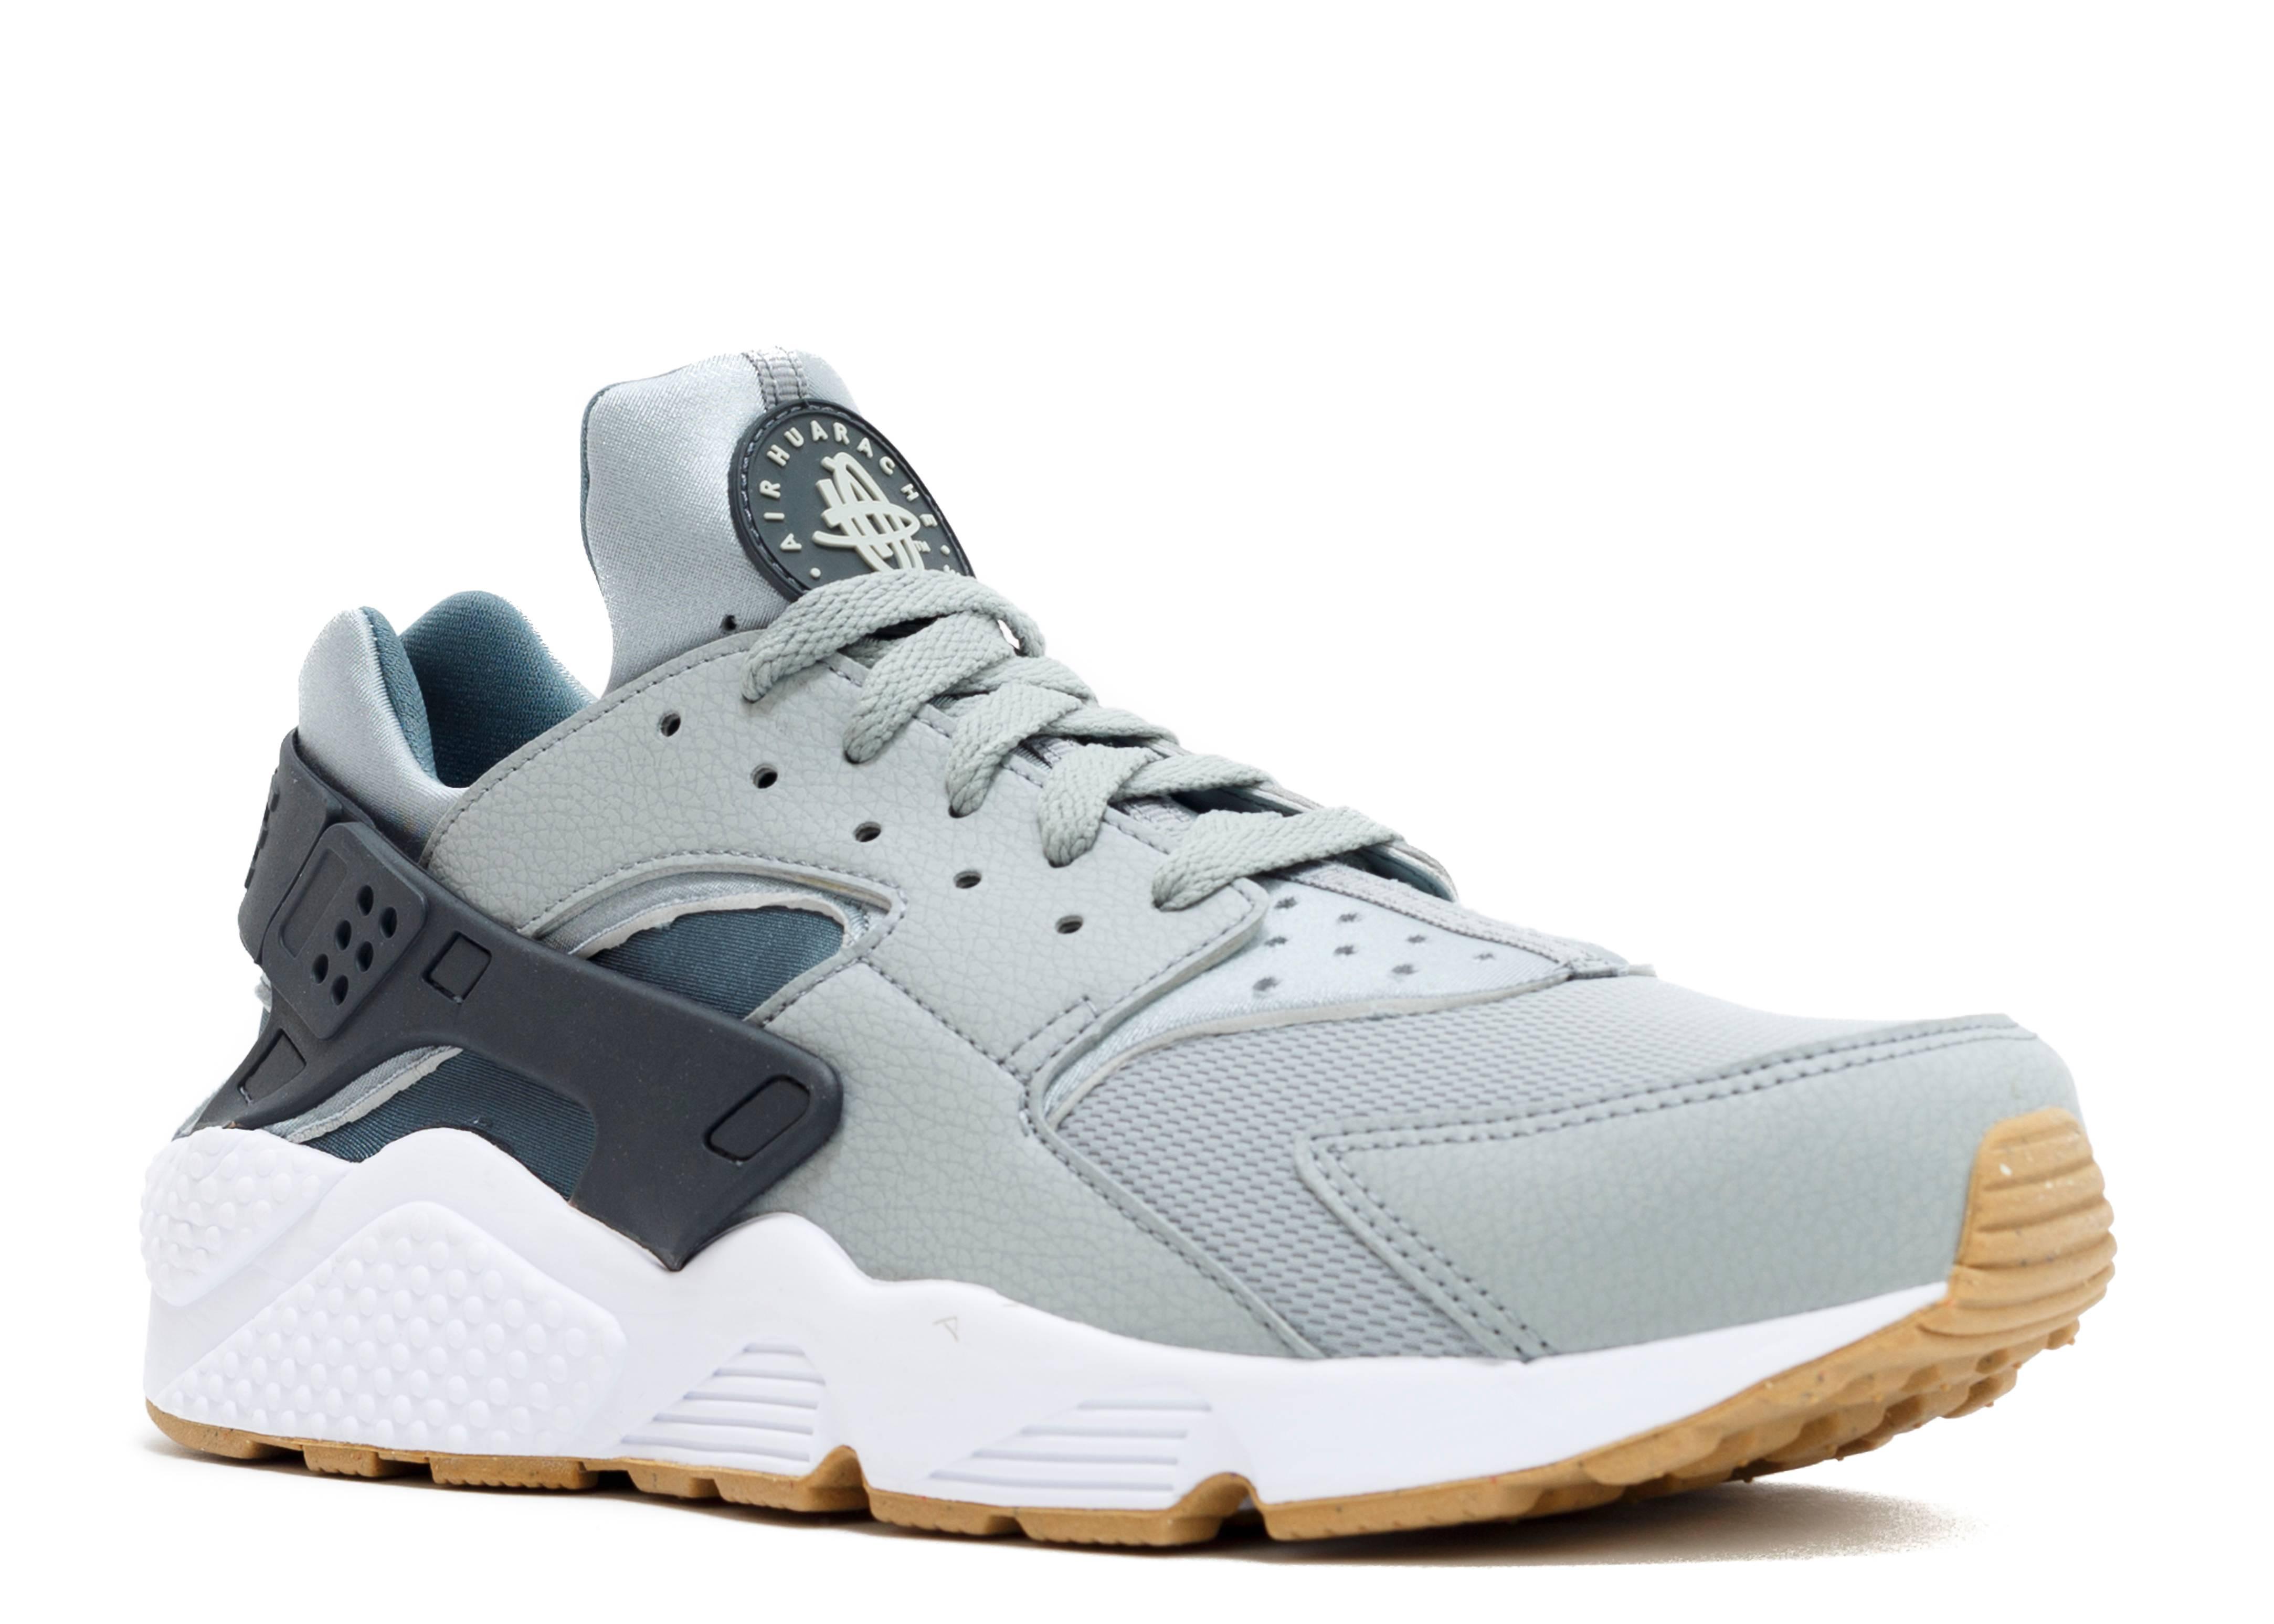 Nike Air Huarache Men's Shoes Shark/Hasta/White/Anthracite 43